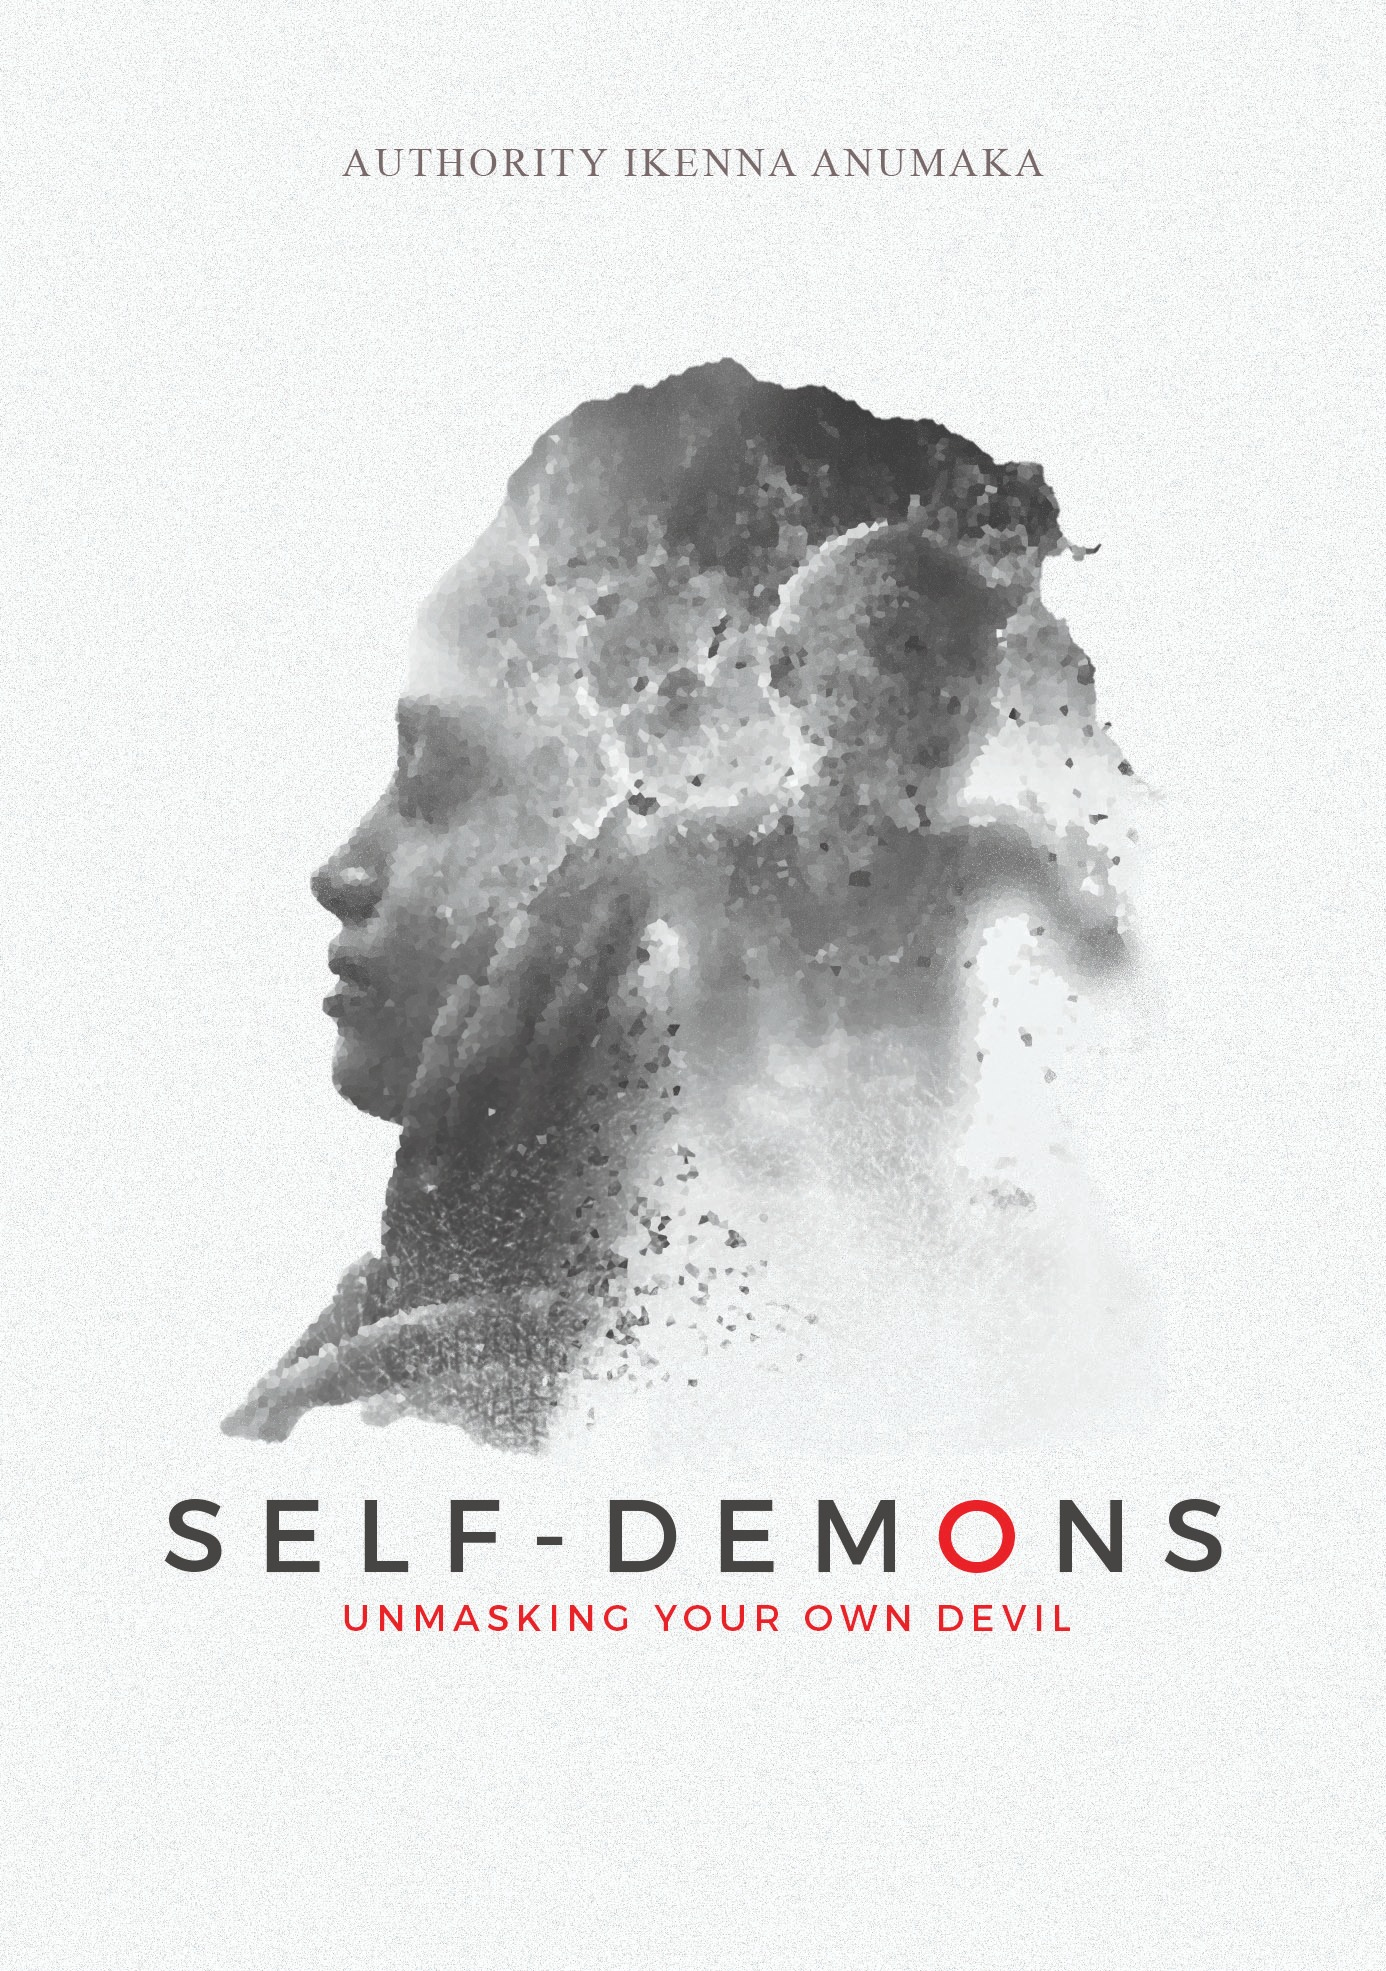 Self-Demons